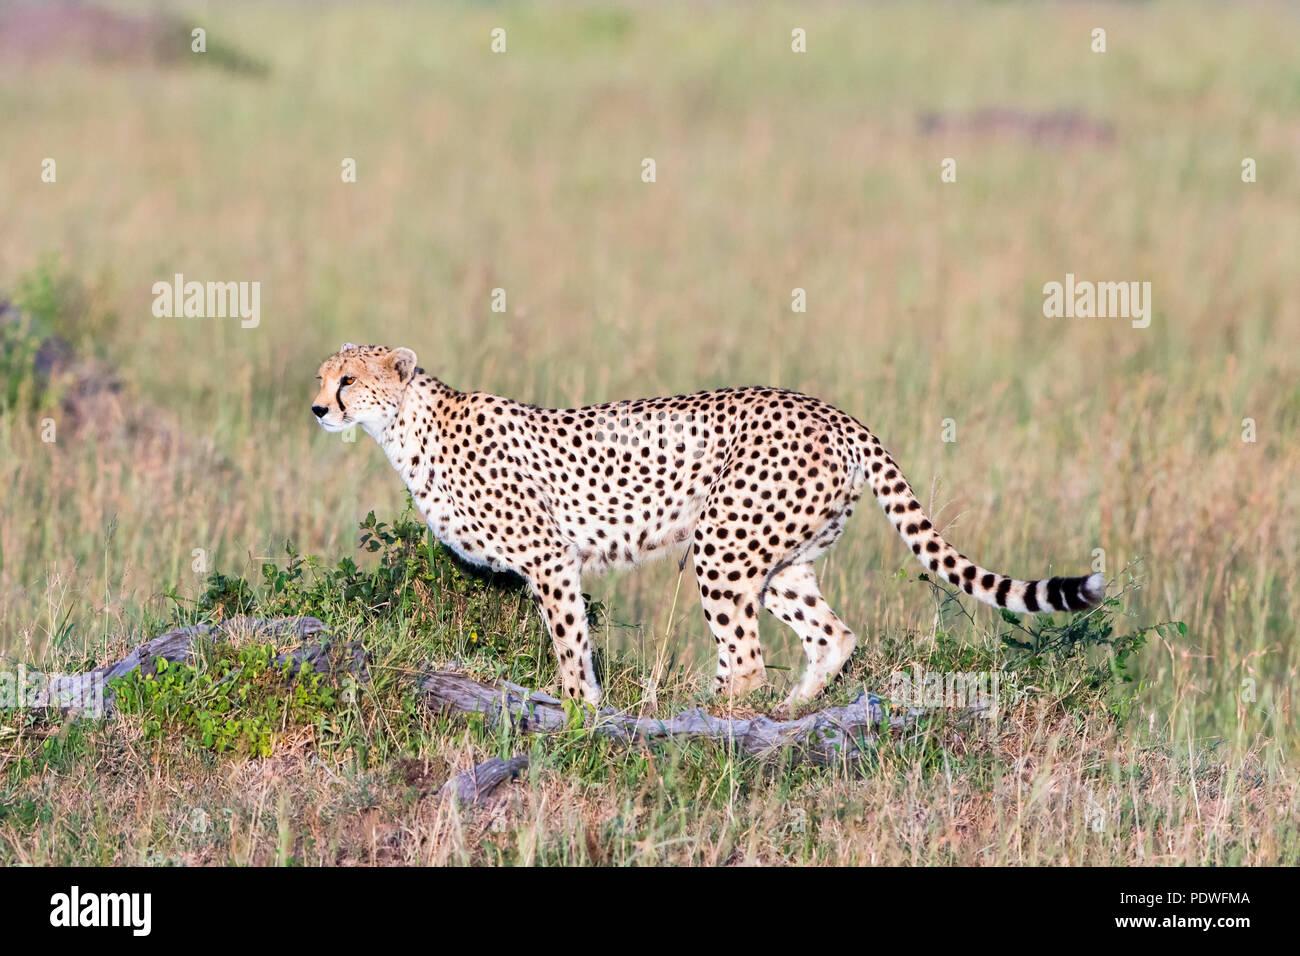 Watchful Cheetah in the savanna - Stock Image